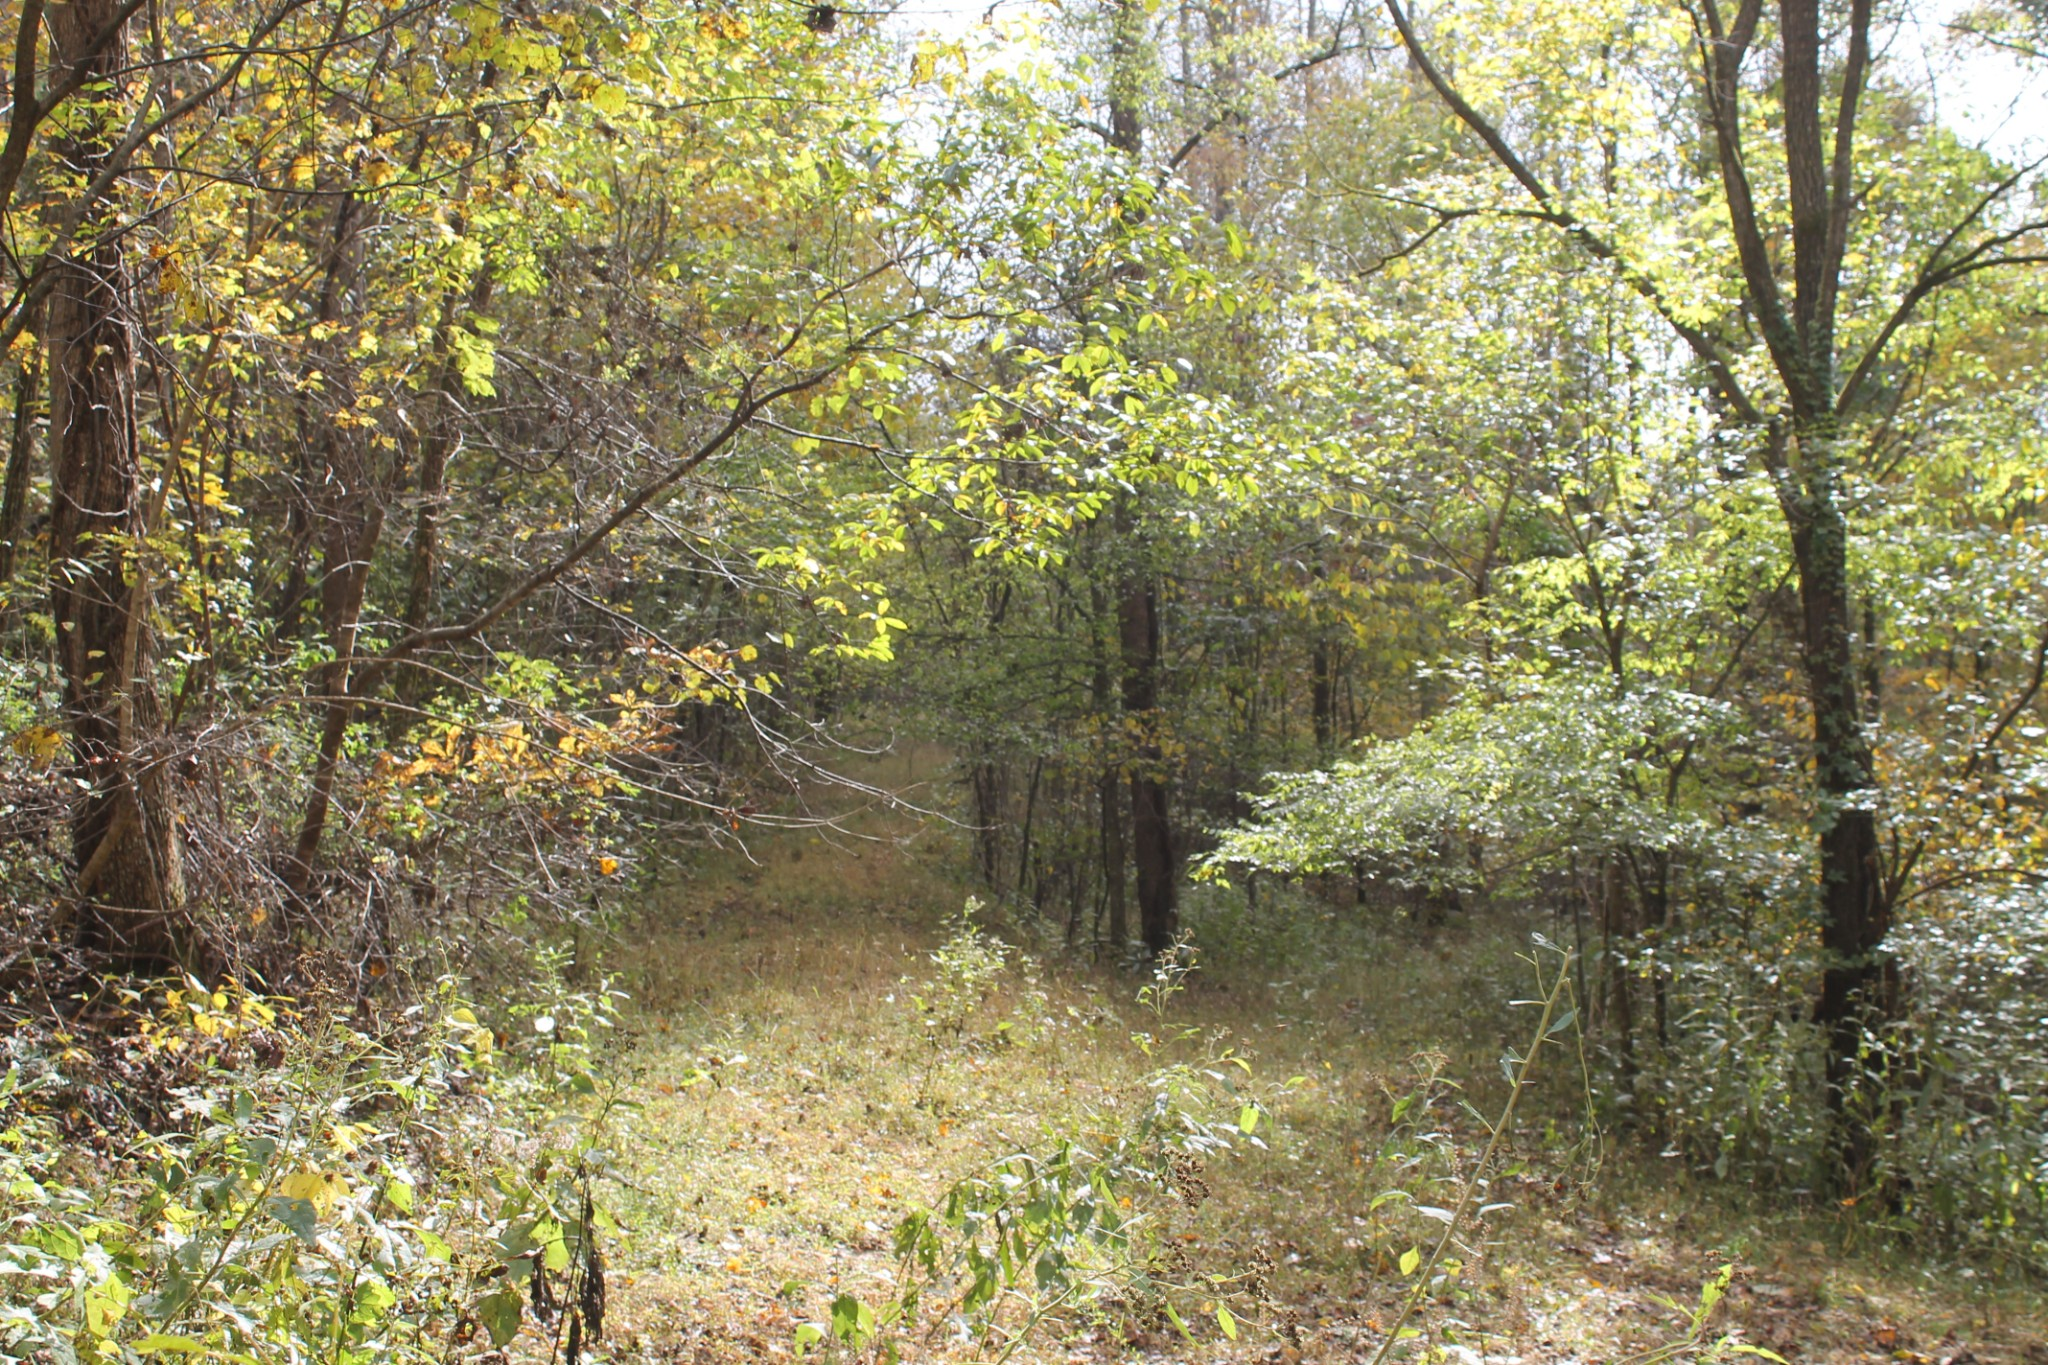 0 Hix Hollow Road, Gainesboro, TN 38562 - Gainesboro, TN real estate listing